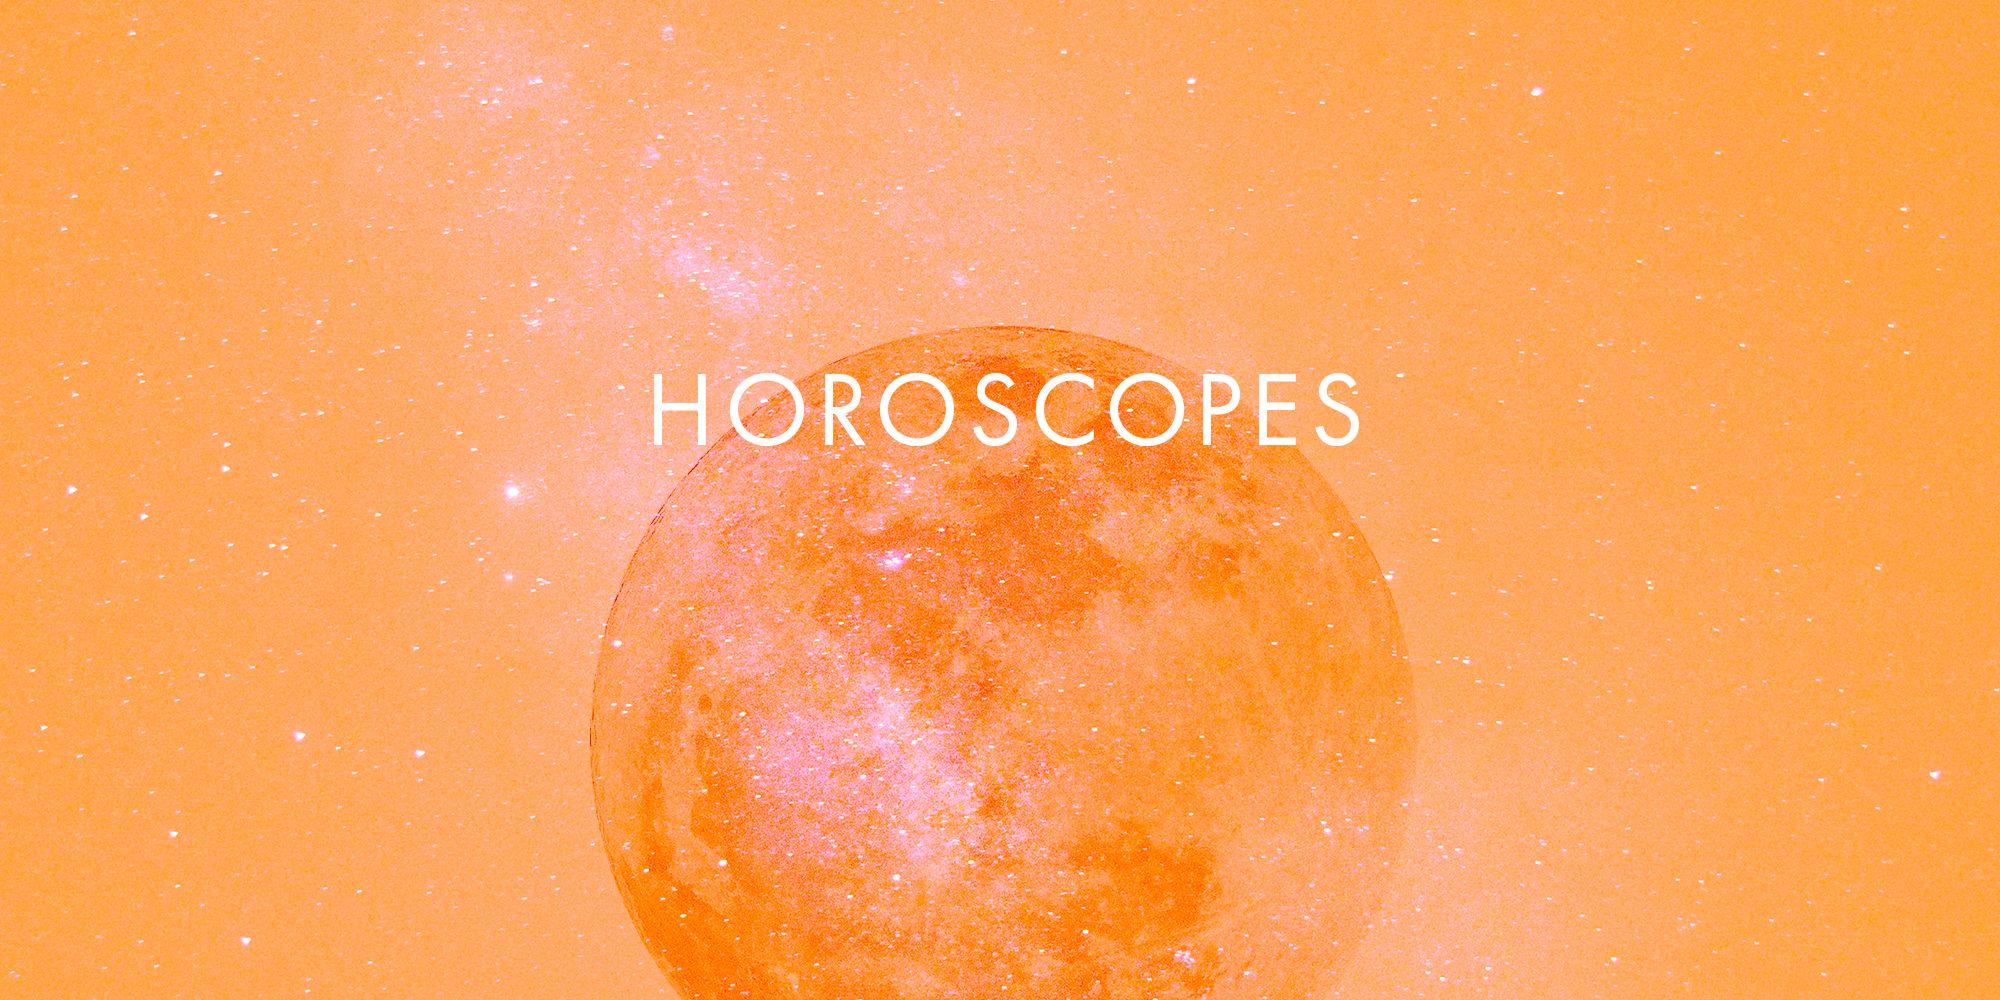 weekly horoscope gemini december 9 2019